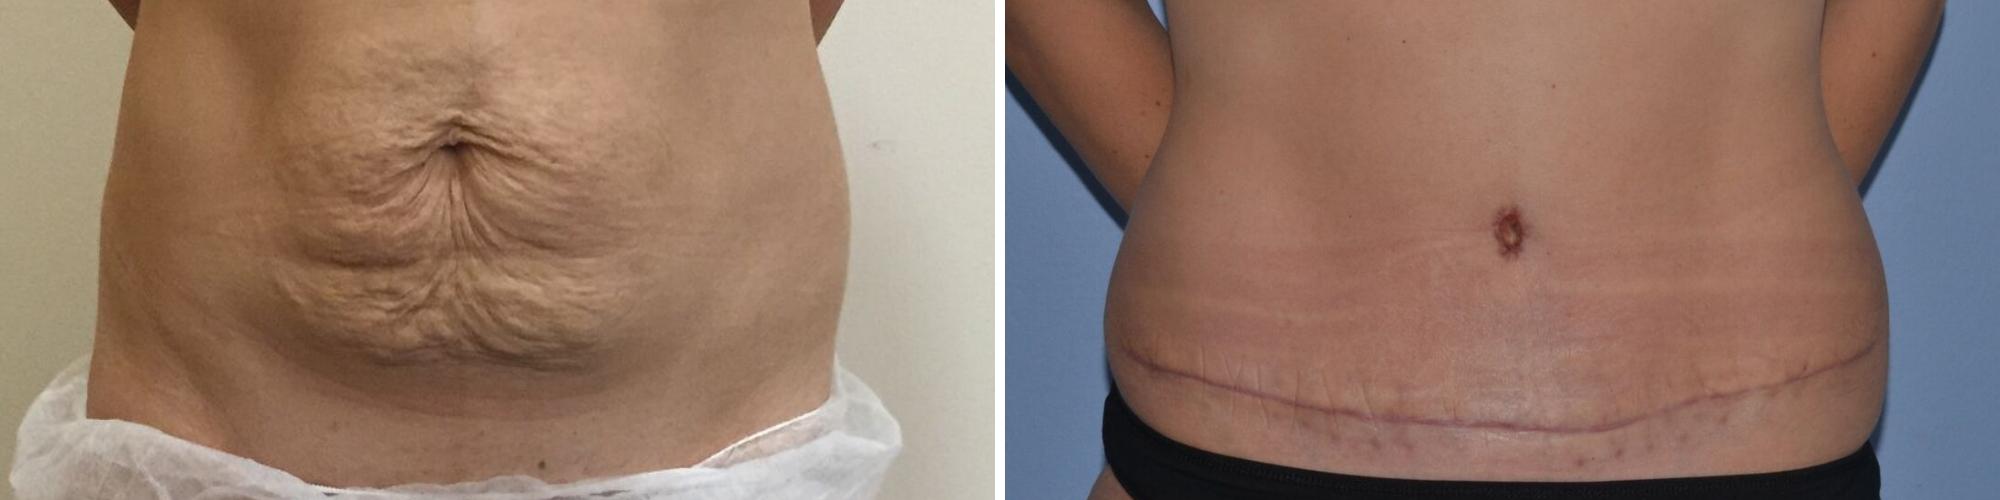 Tummy Tuck before and after UK, Mini Tummy Tuck London, Mini ...